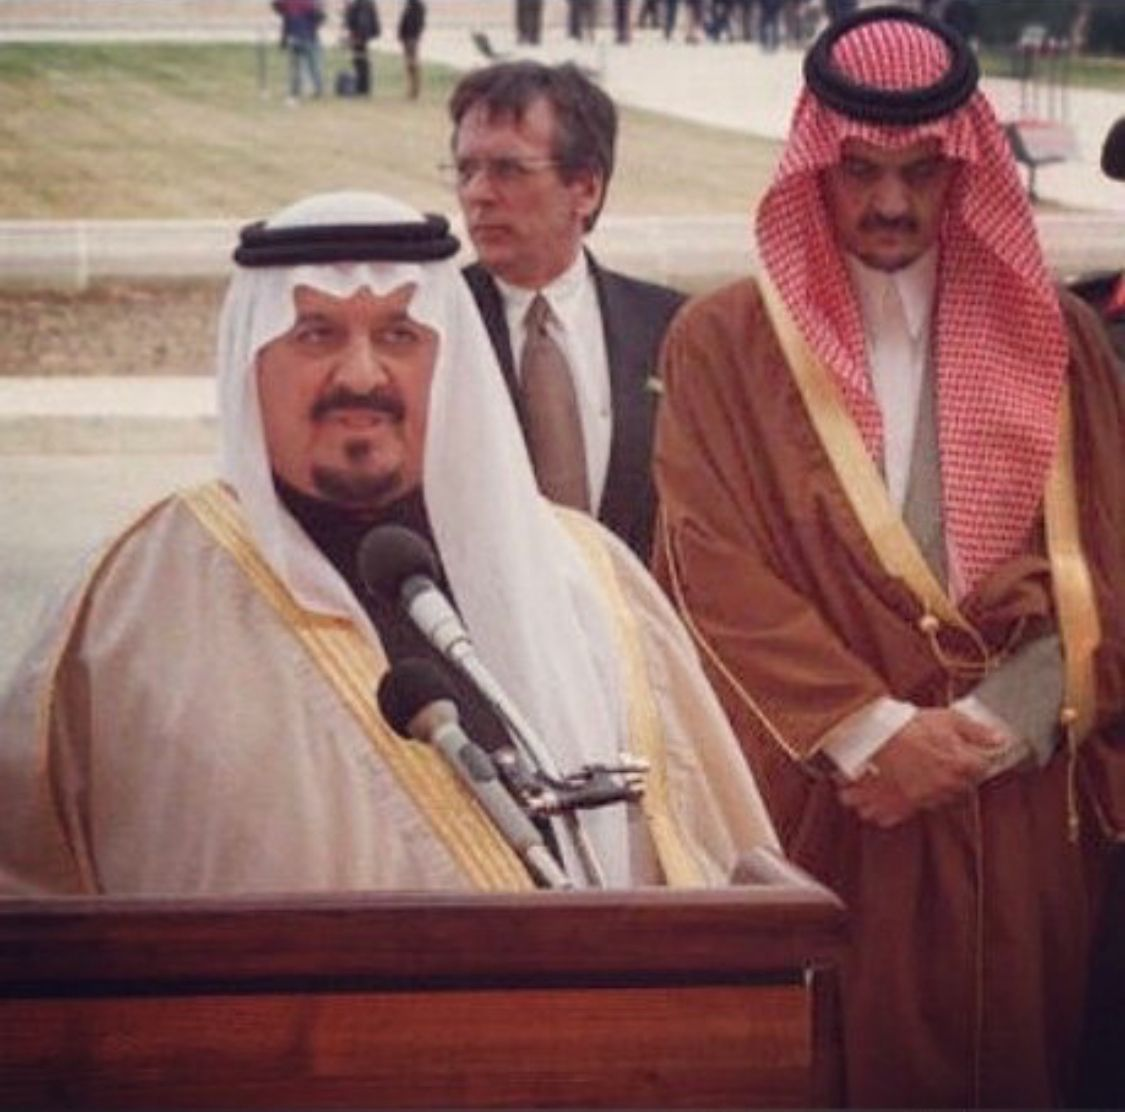 Pin By سلمان العتيبي On W Q98 Face Art Royal Family King Faisal